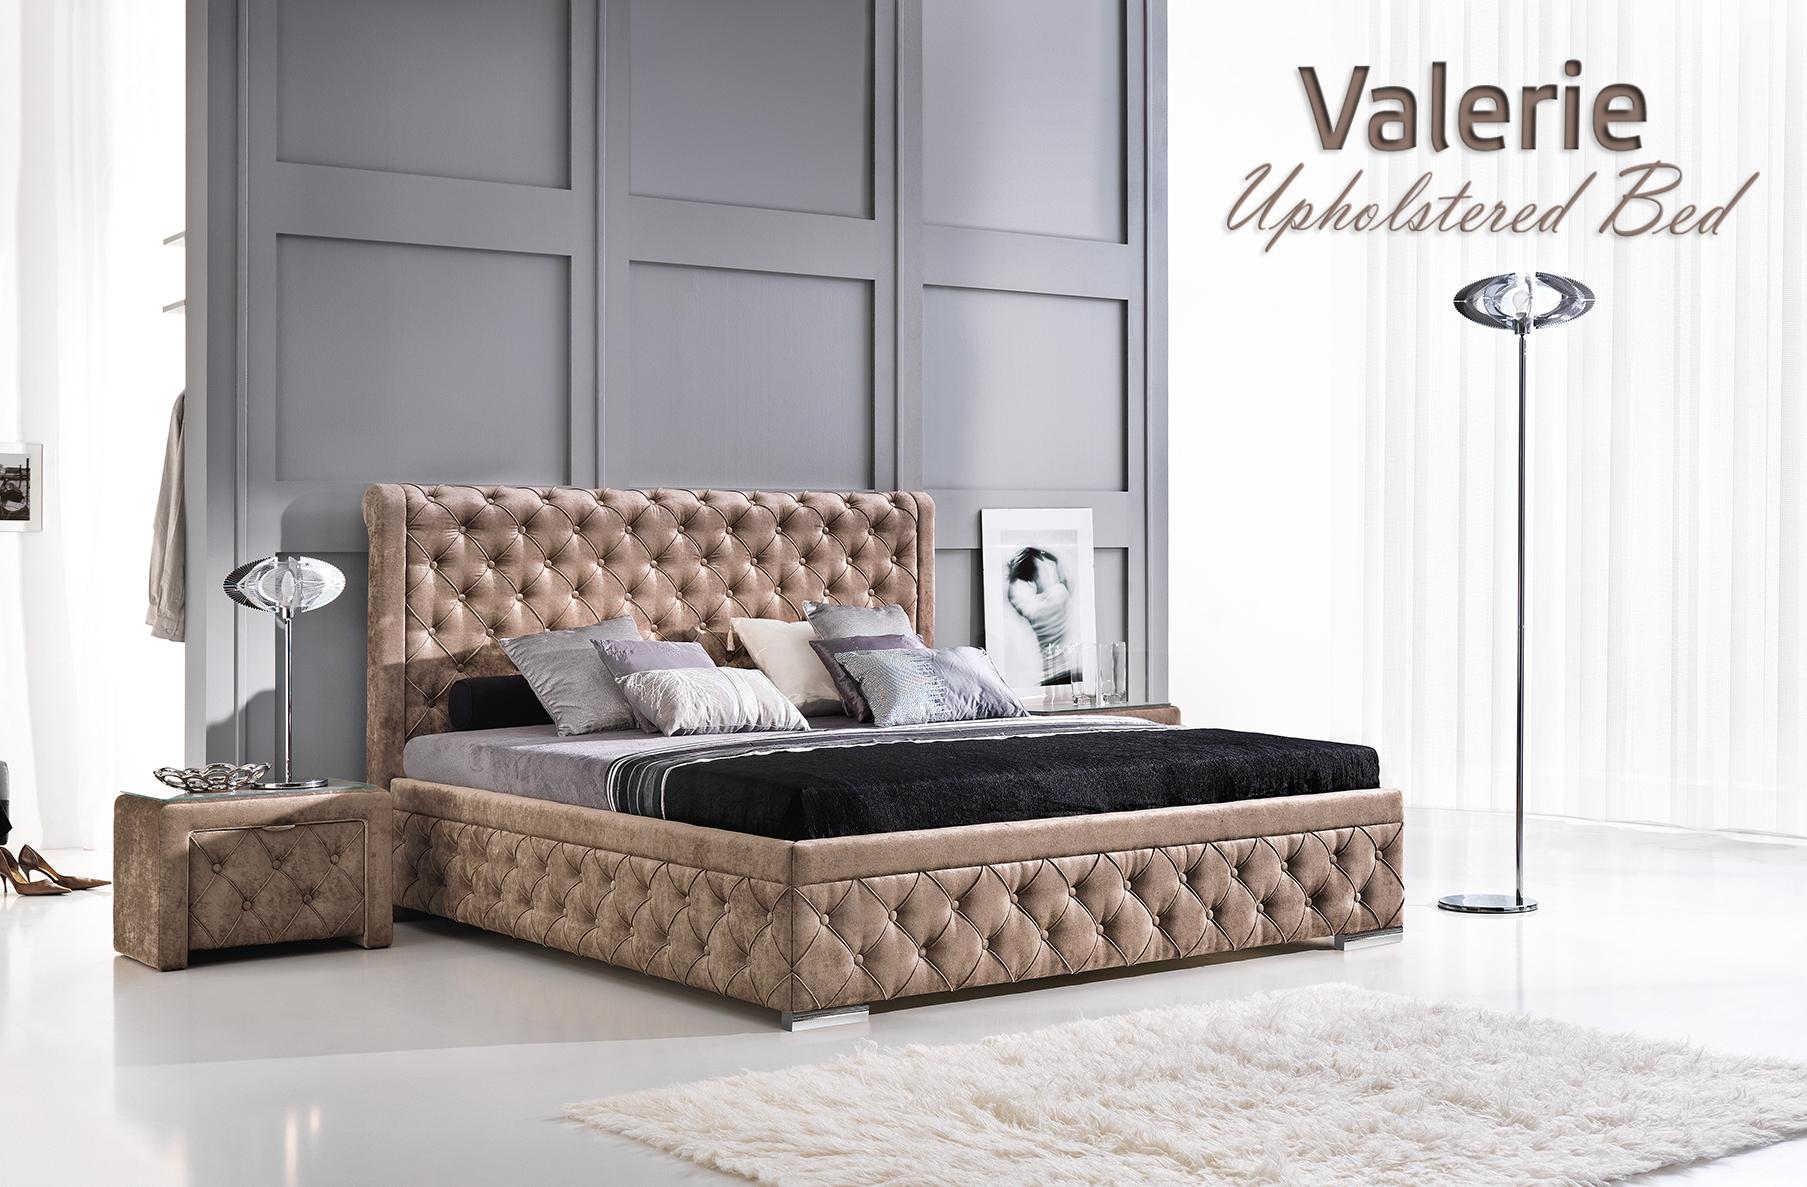 Valerie Bed, Cheap